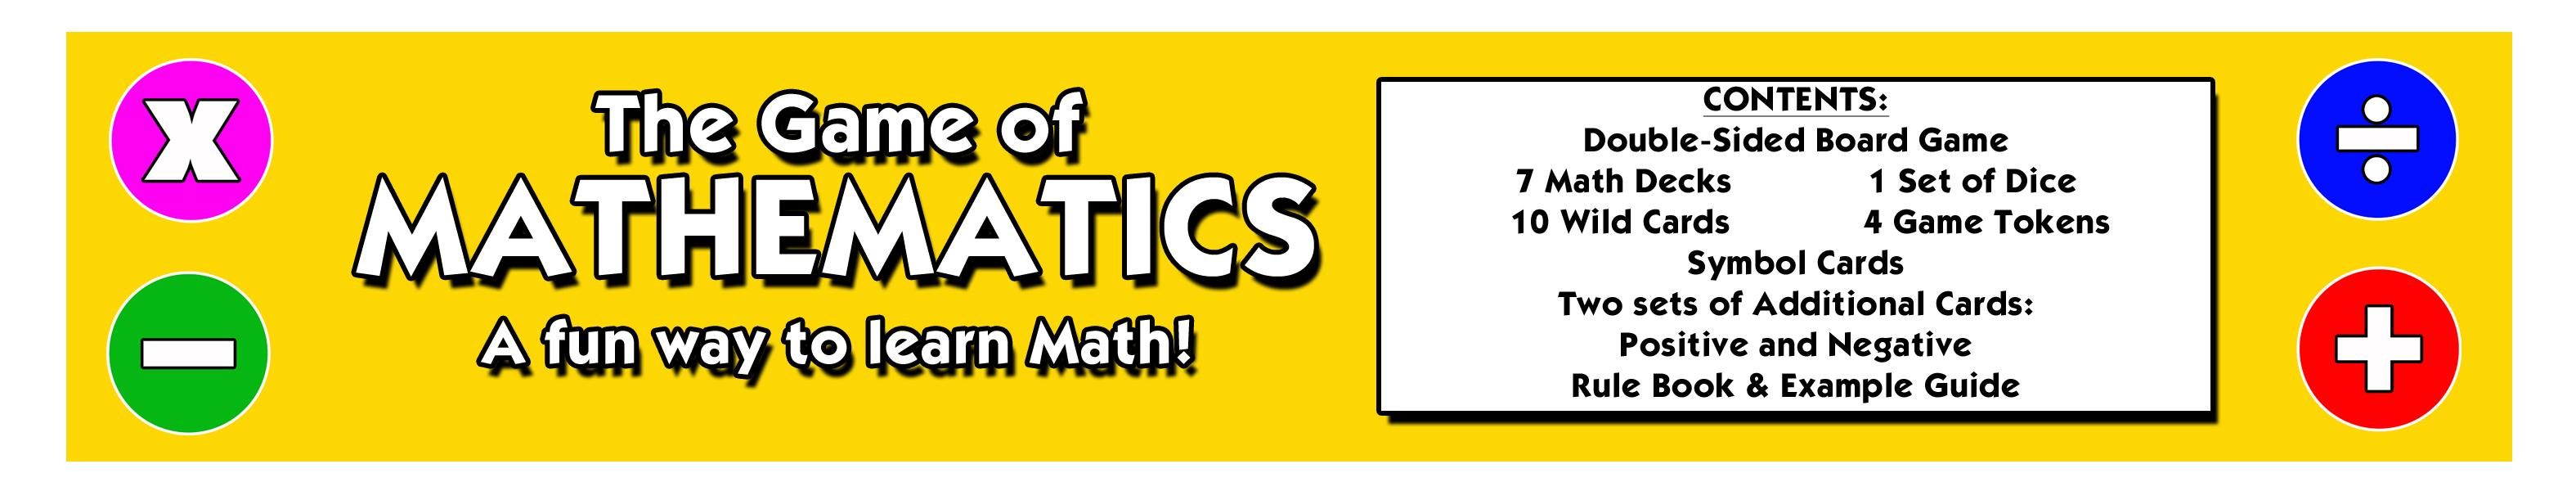 game_of_mathematics-sidepanel4